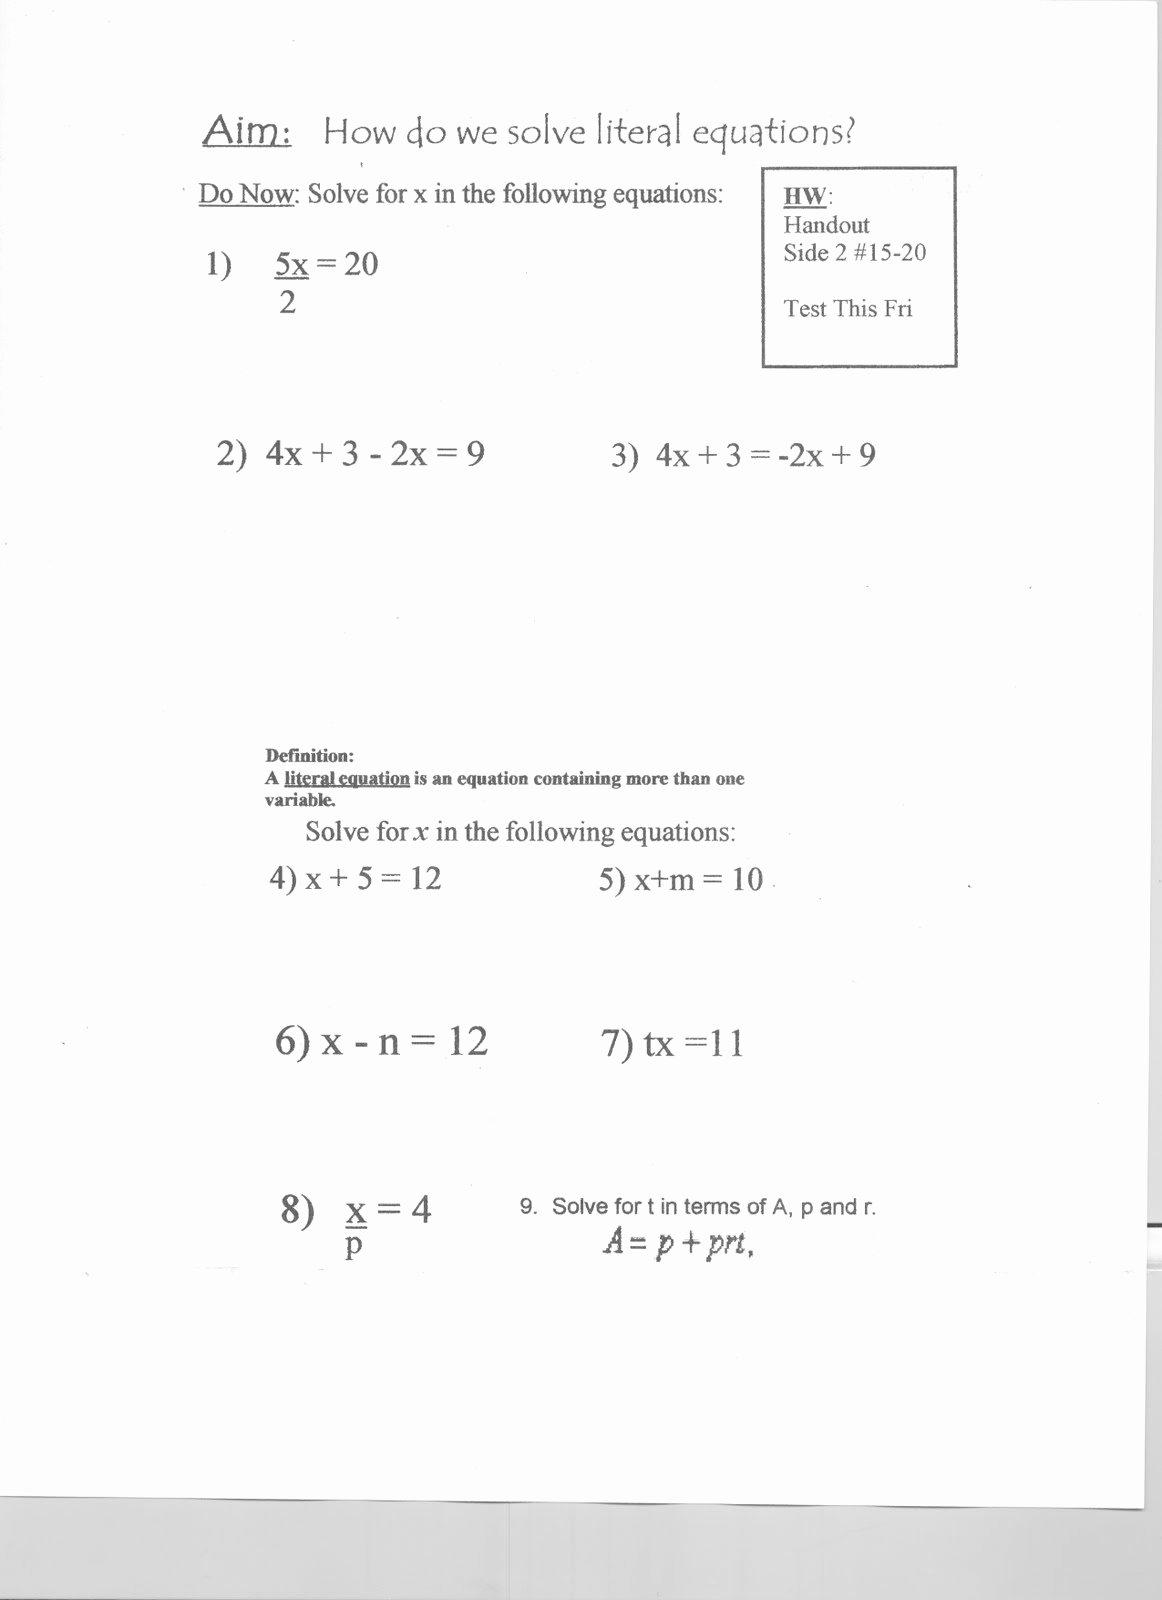 Literal Equations Worksheet Algebra 1 Lovely Mr Napoli S Algebra Aim What are Literal Equations and